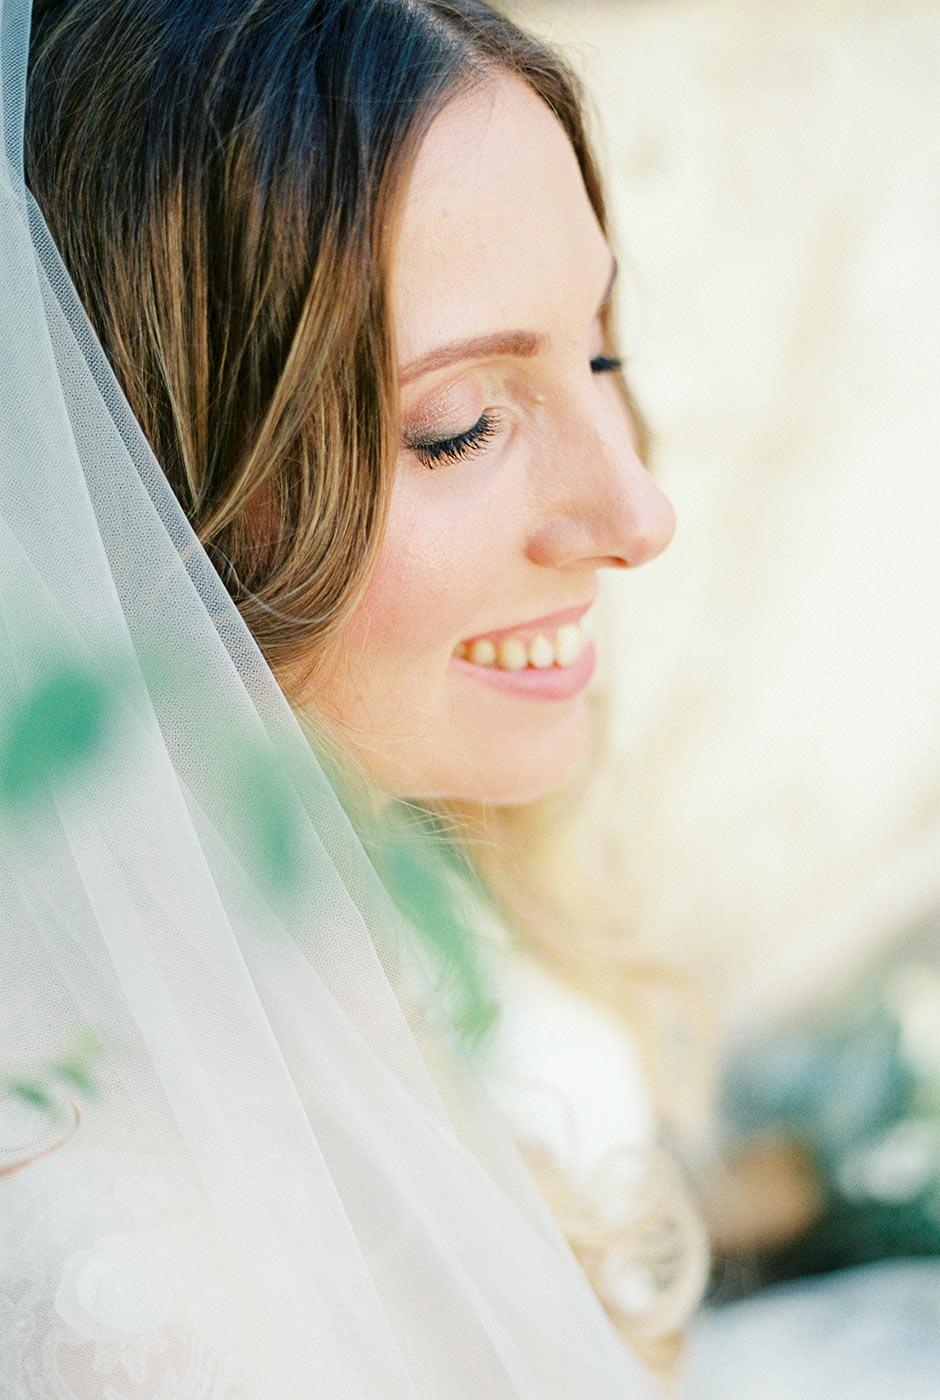 Bride's portrait | Fine Art Photographer | Lena Karelova Photography | Destination Wedding Photographer Barcelona |Film Wedding Photographer